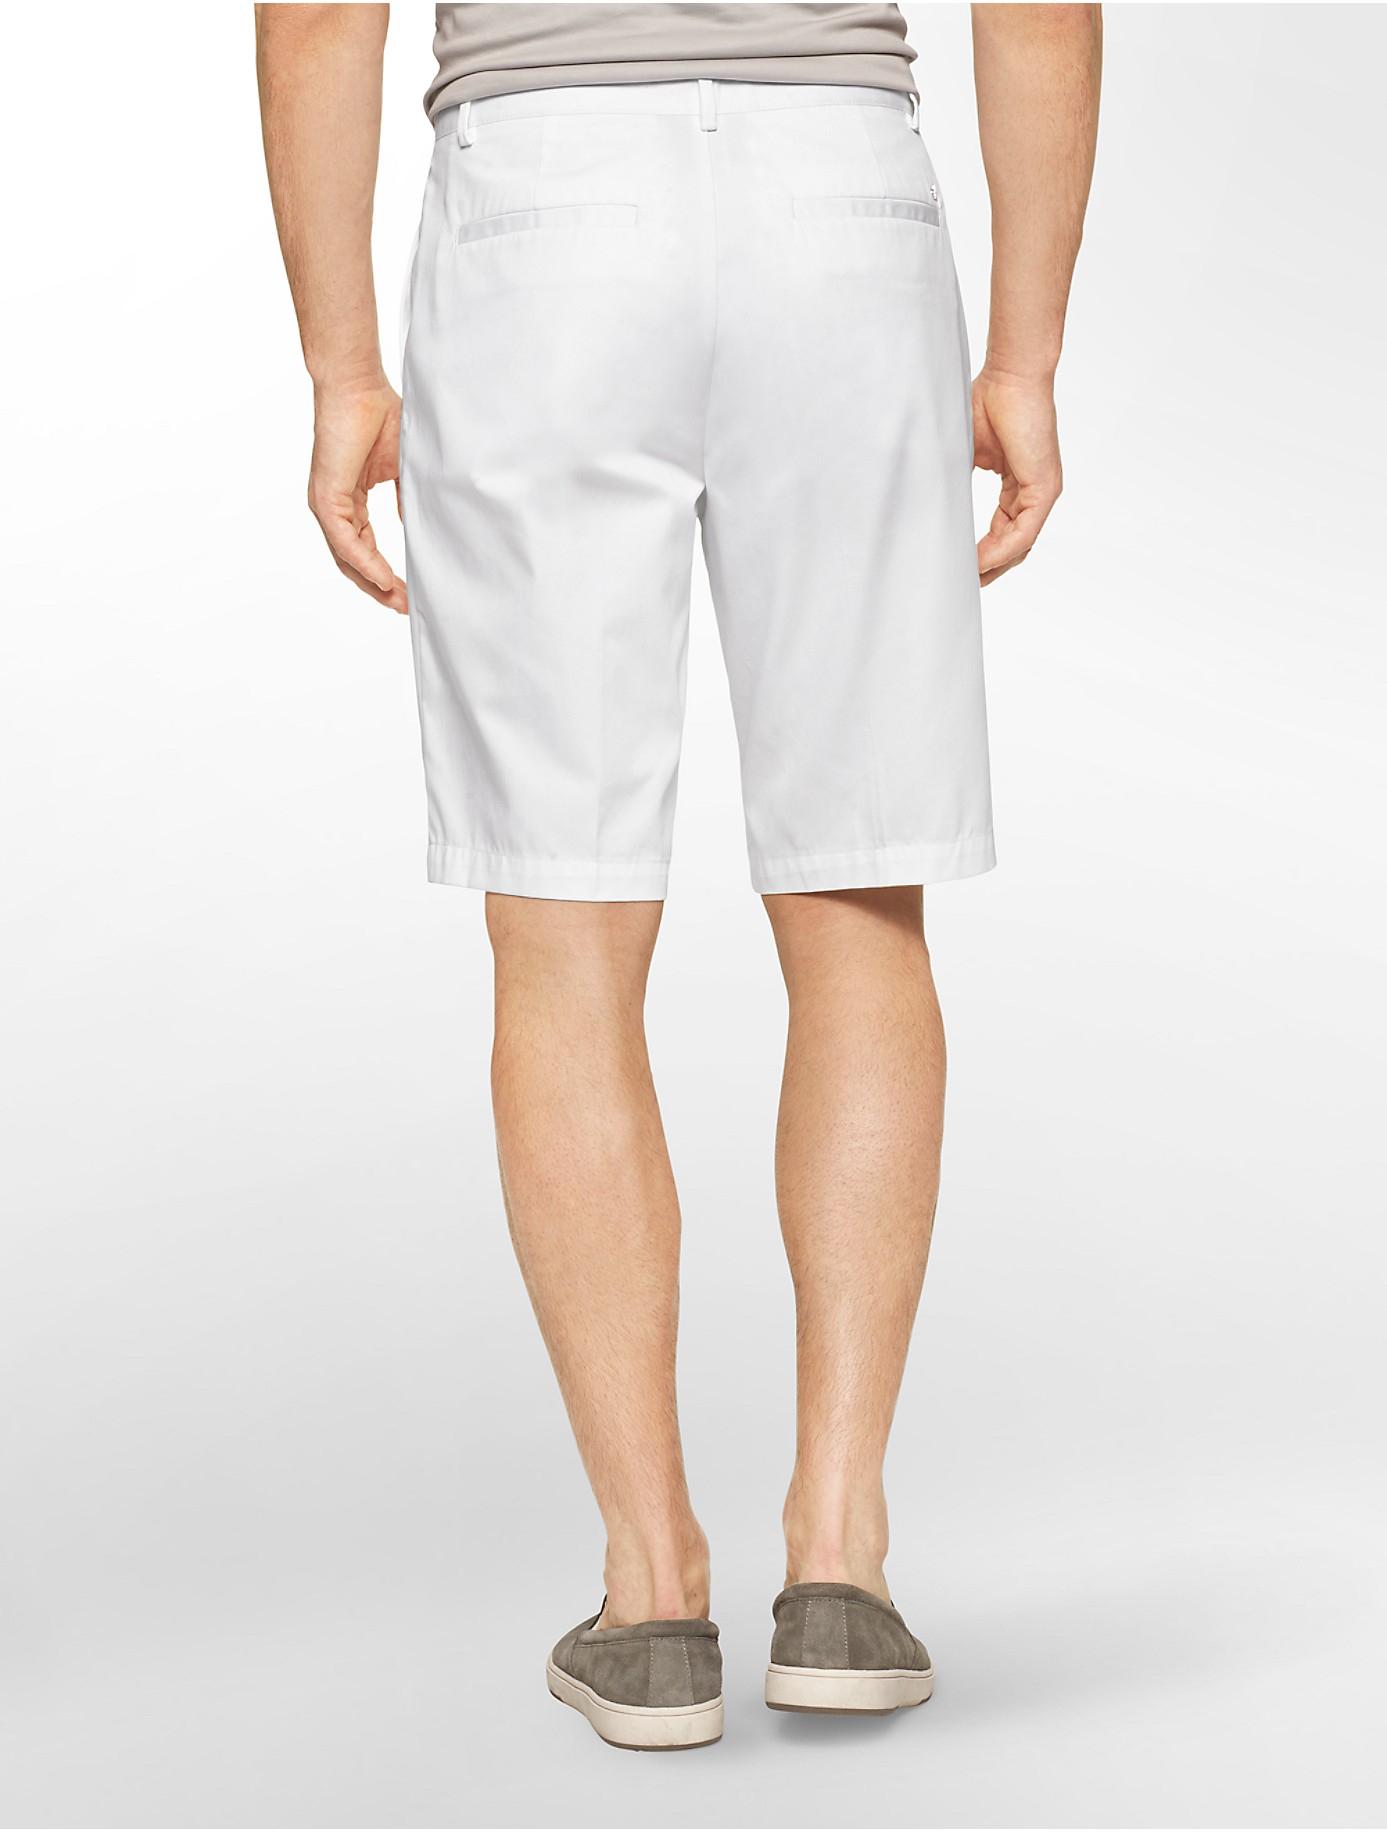 Calvin klein White Label Slim Fit Chino Walking Shorts in White ...